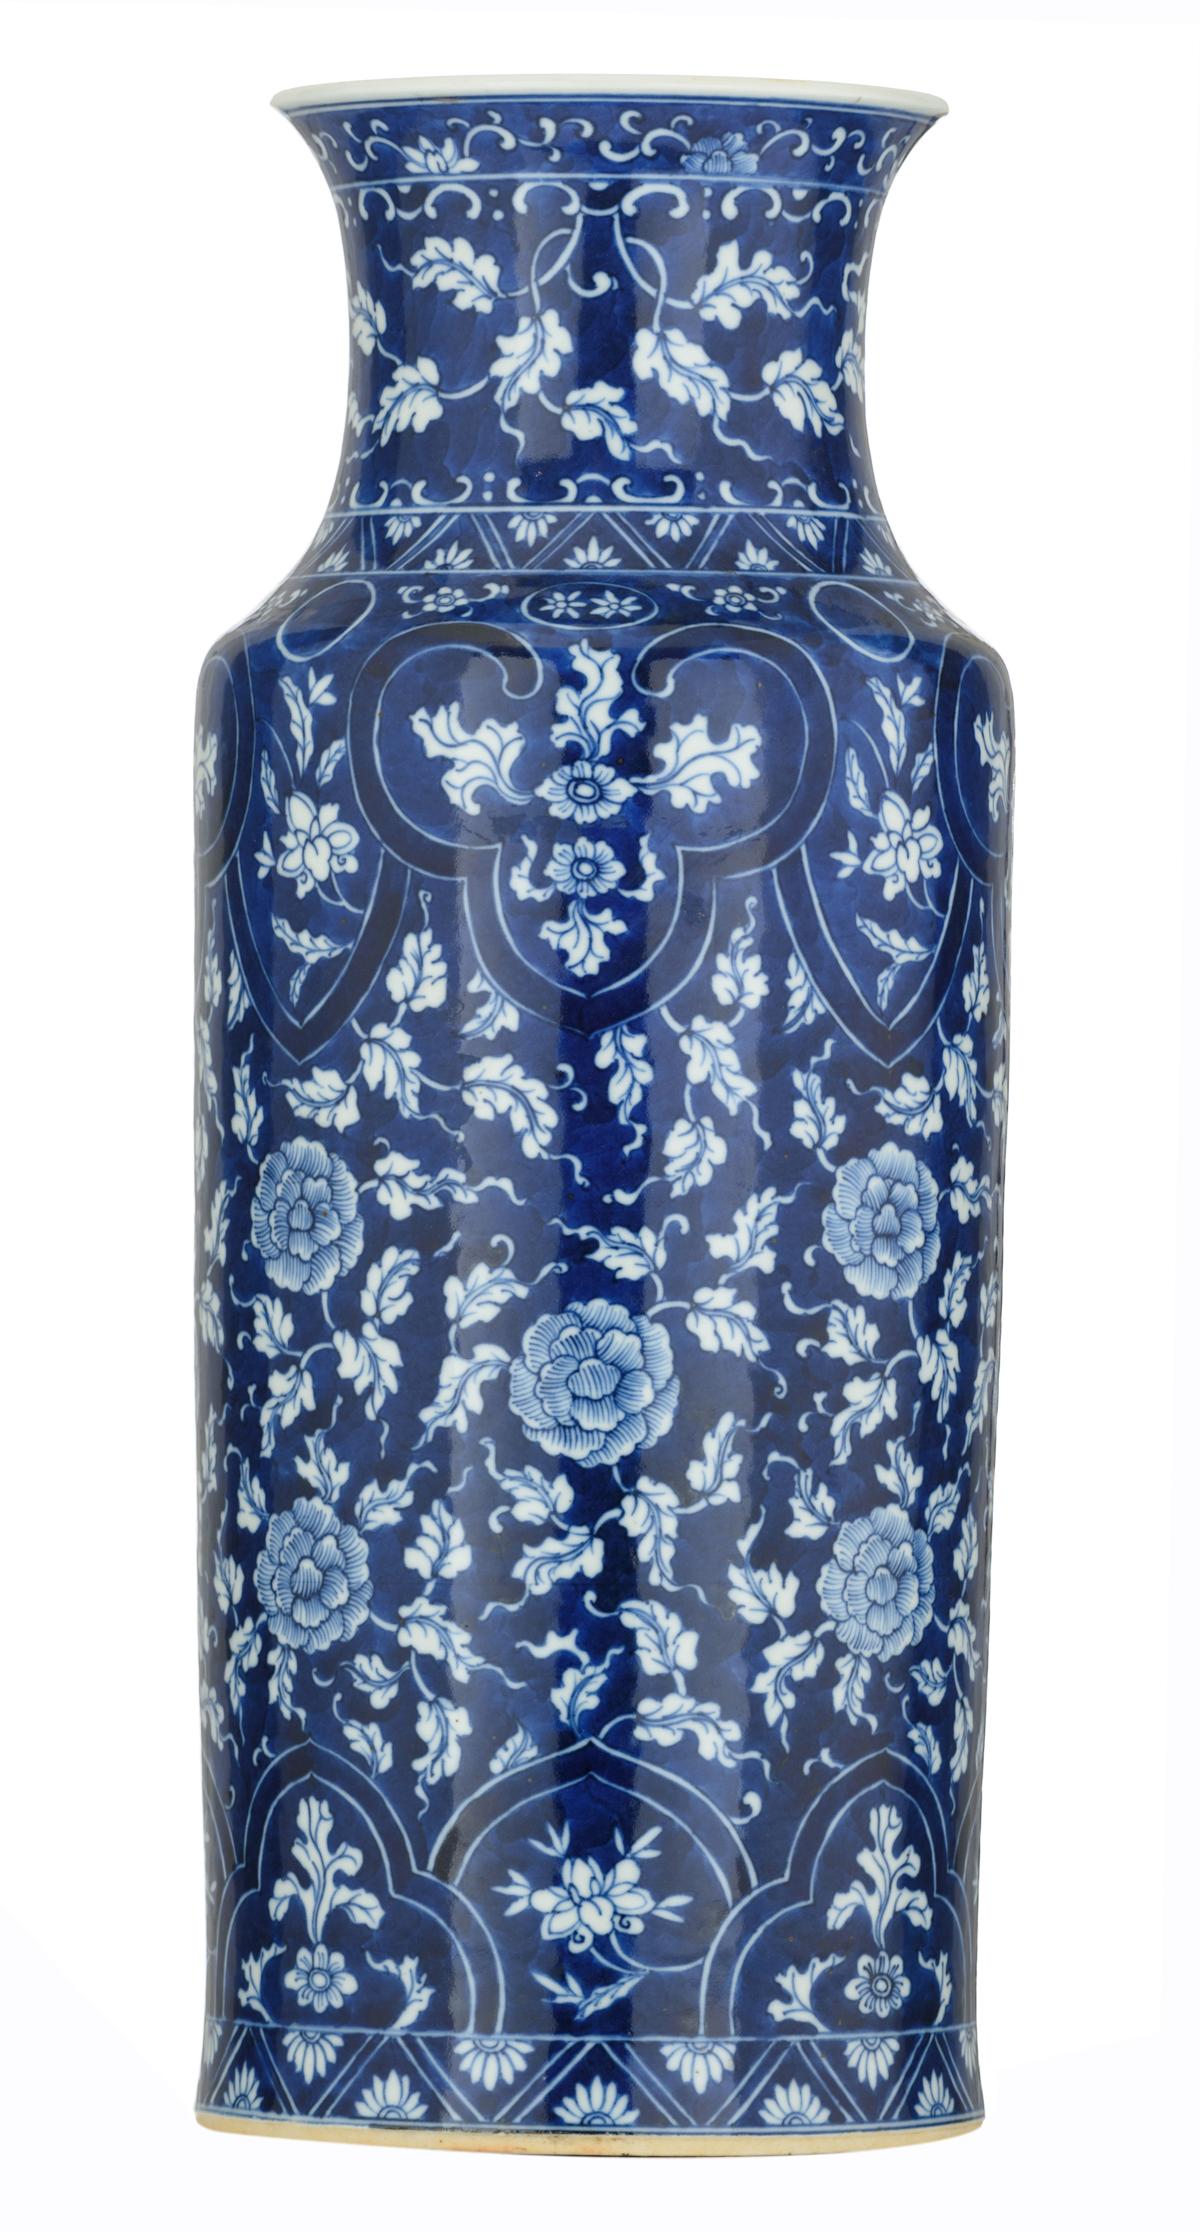 Lot 52 - A blue and white floral decorated porcelain rouleau vase, 19thC, H 47,7 cm